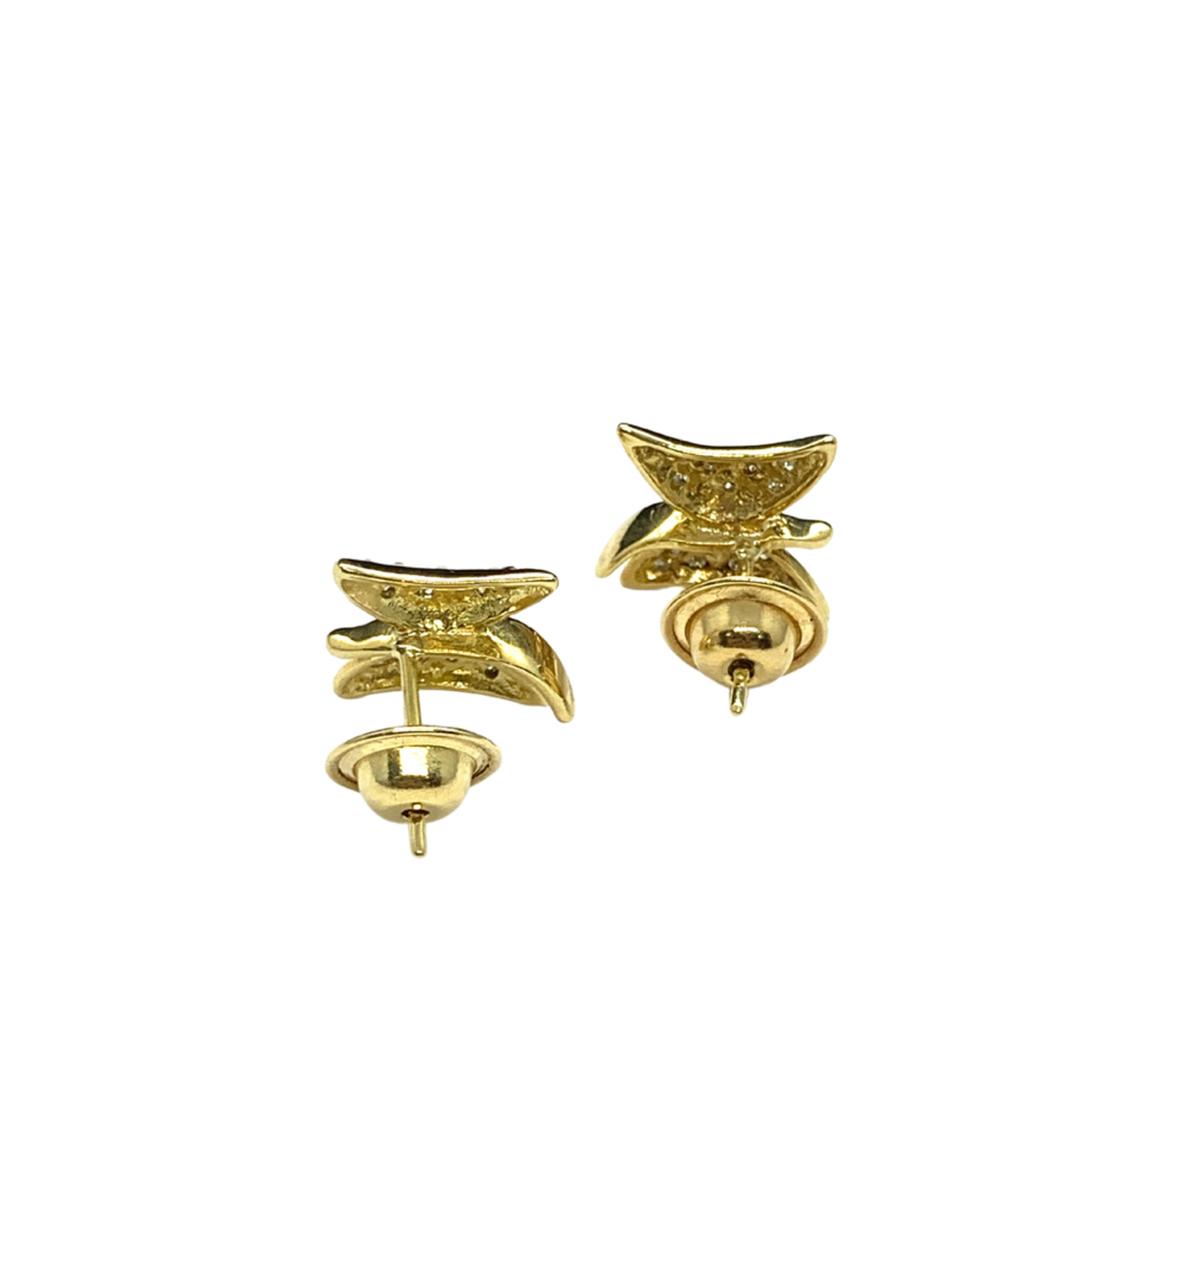 Brinco Ouro 18K Borboleta Com Brilhante Jjoias Premium